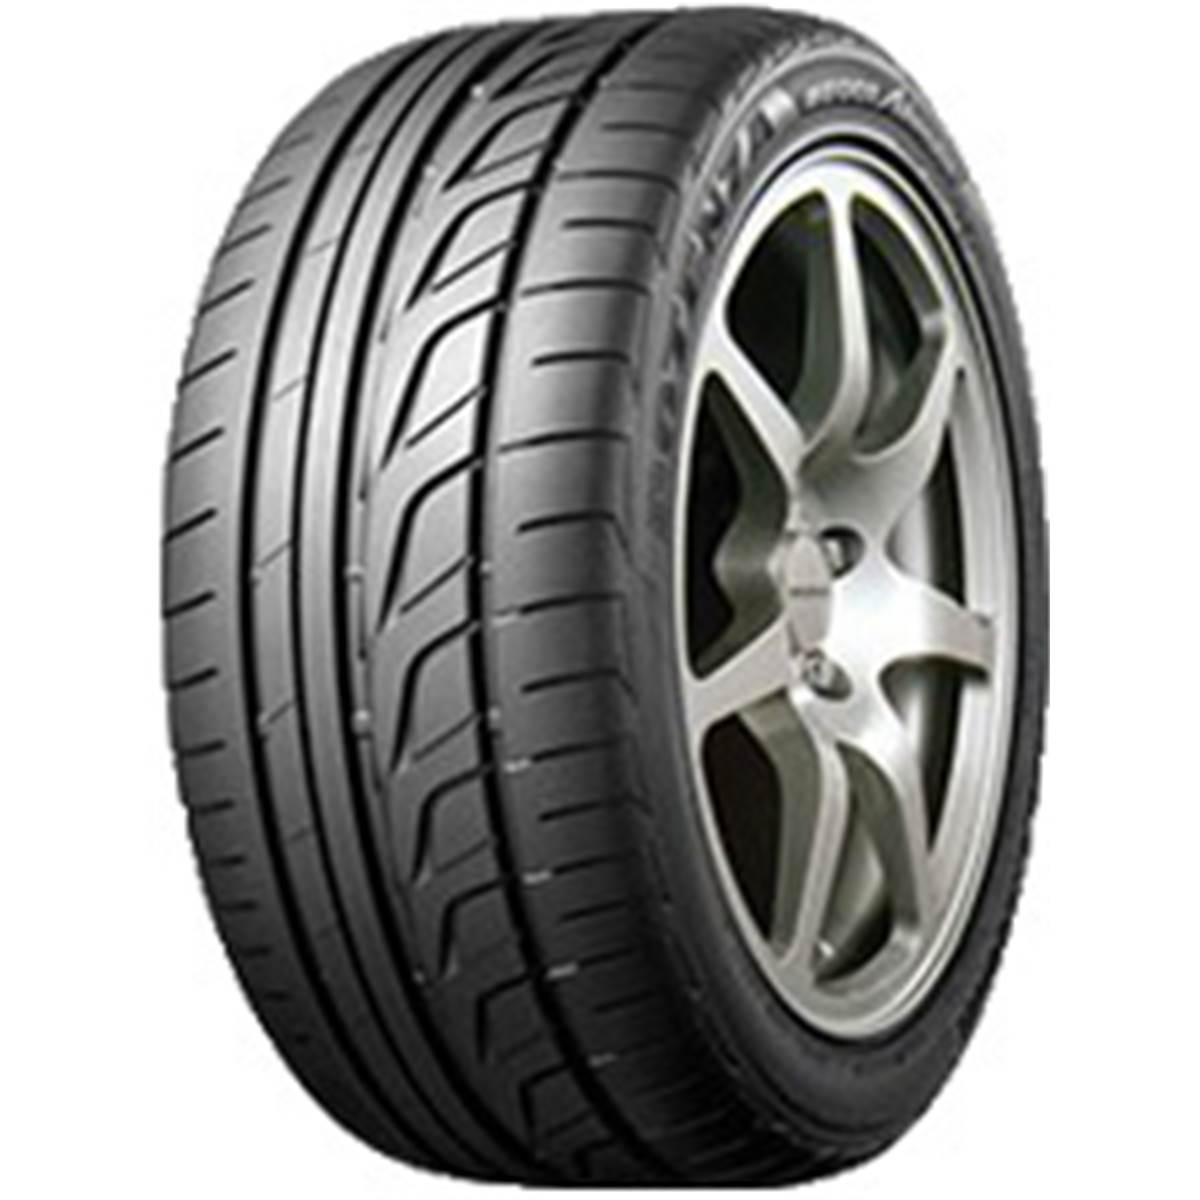 Pneu Bridgestone 215/55R16 97W Potenza Adrenalin Re002 XL